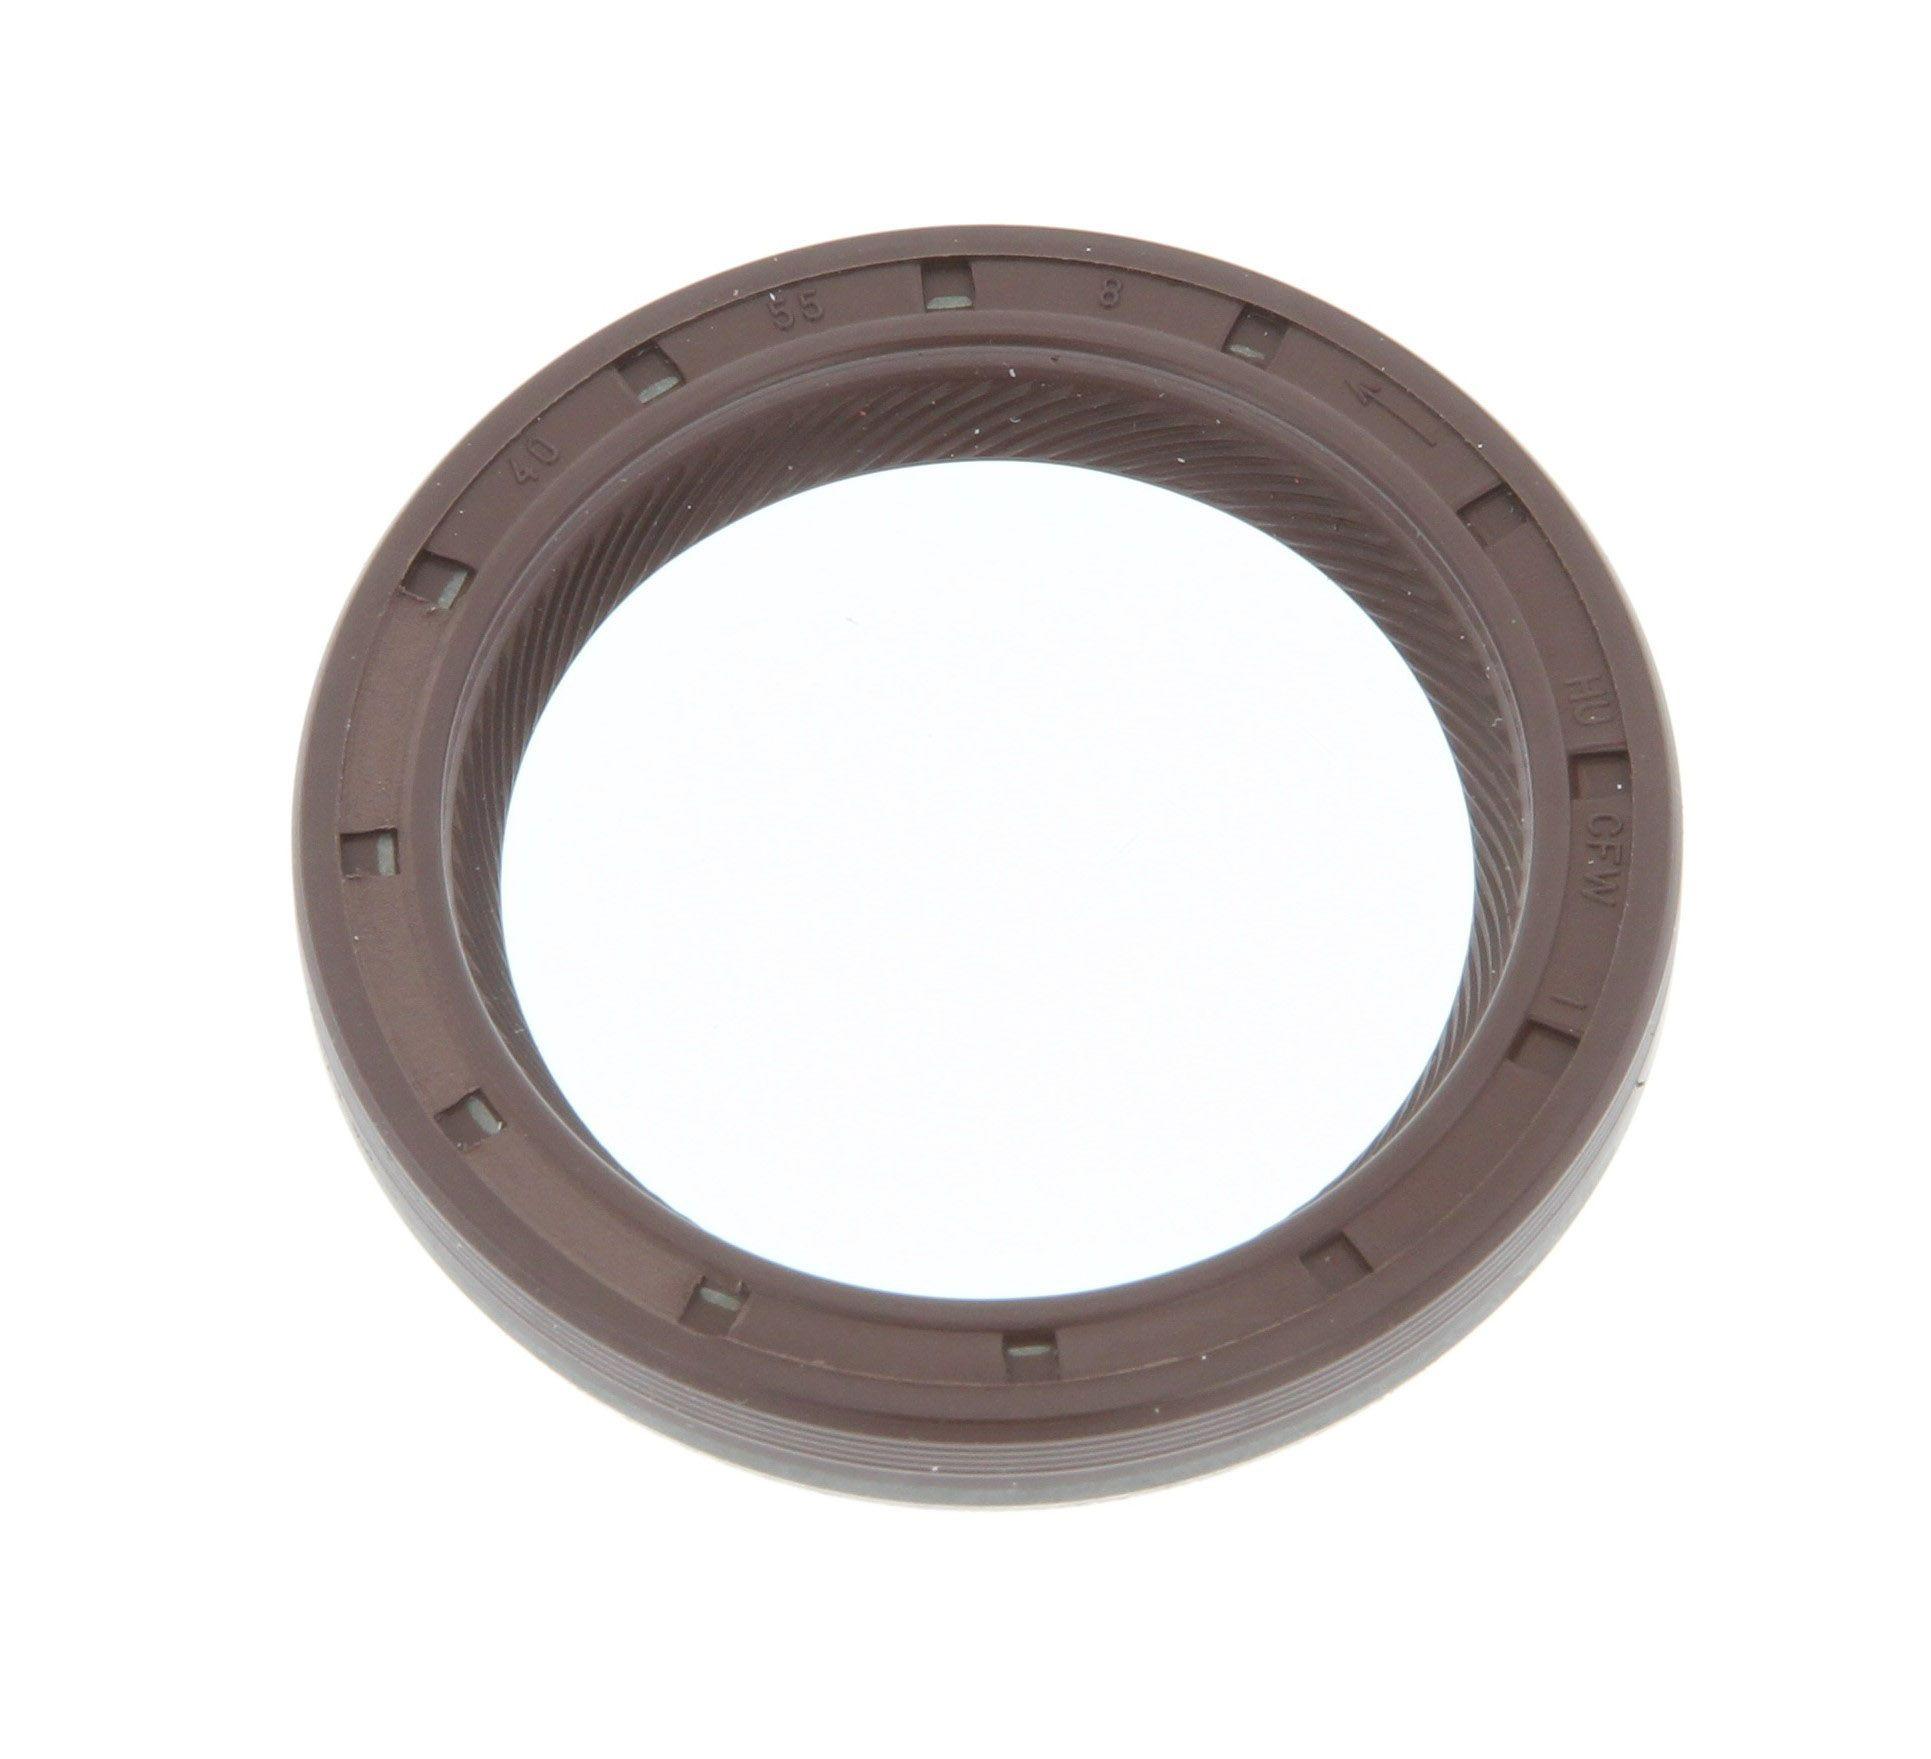 MERCEDES-BENZ C-Klasse 2016 Wellendichtring, Schaltgetriebe - Original CORTECO 01019285B